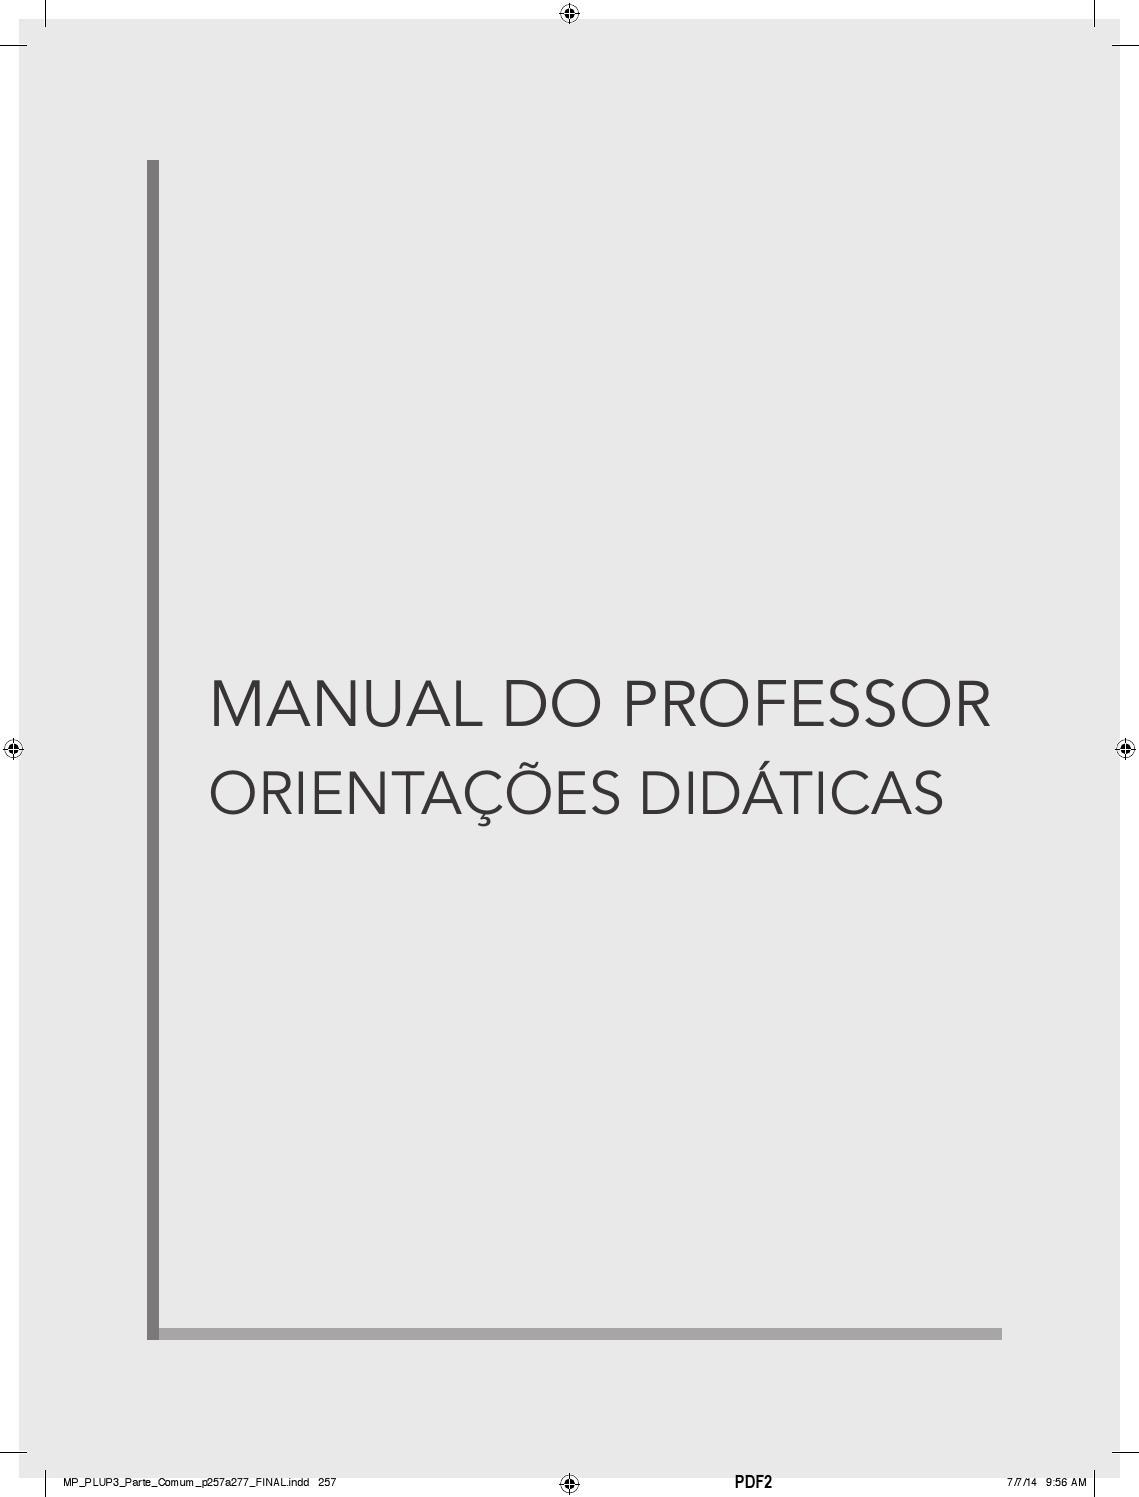 Coopera portugu s 3 ano by somos educa o issuu for Mural de natal 4 ano